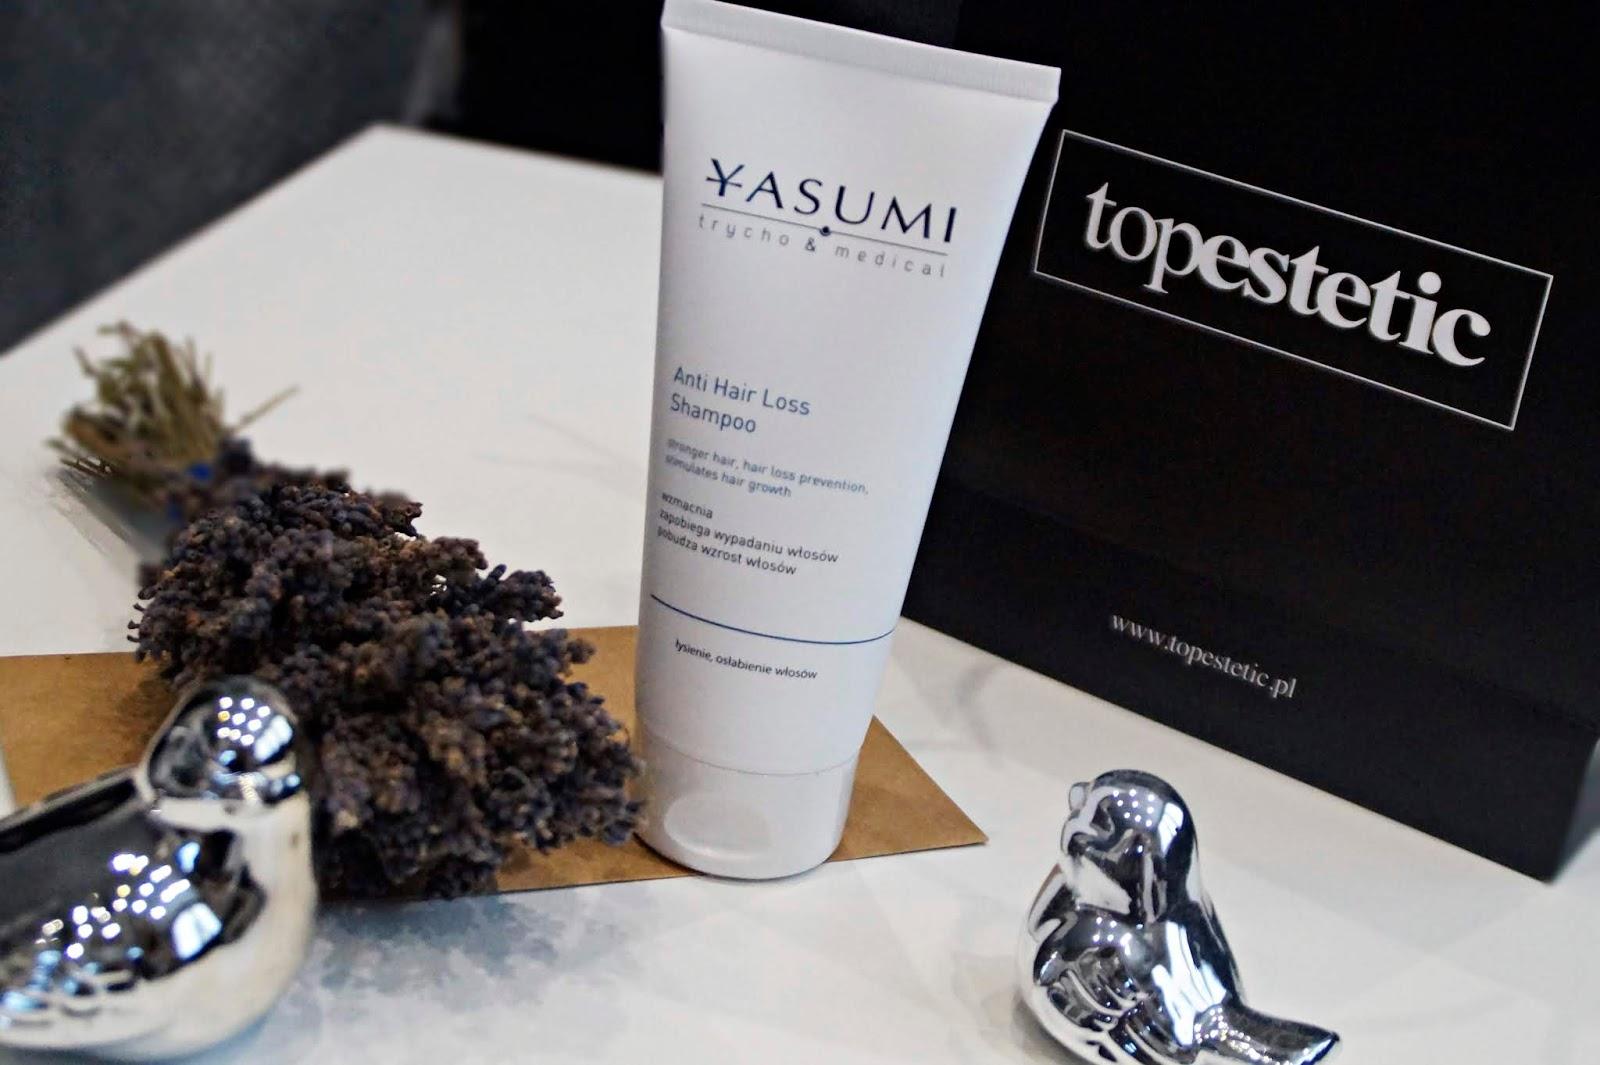 Topestetic - YASUMI // JOWAE // ASCOLIP